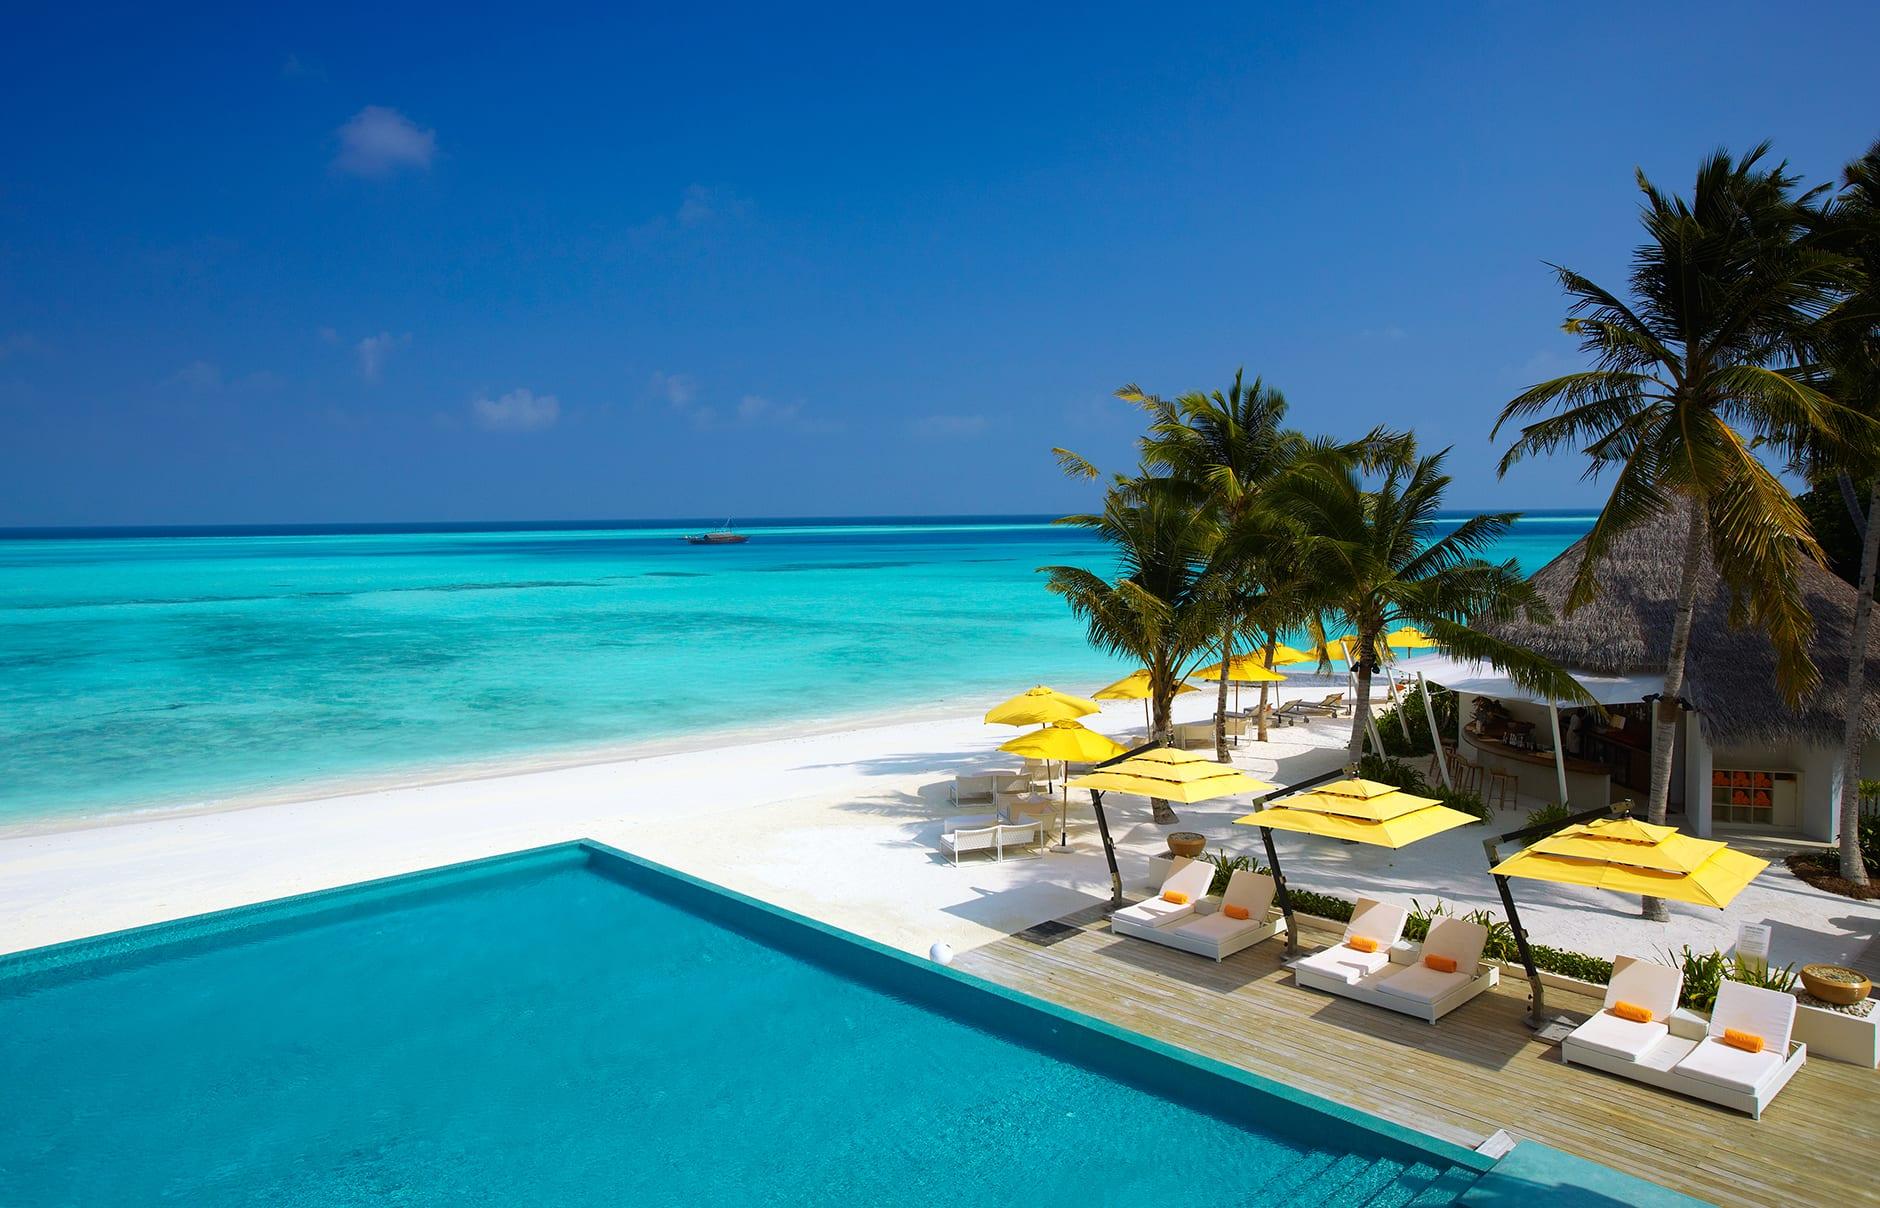 Niyama, Maldives. © Per AQUUM